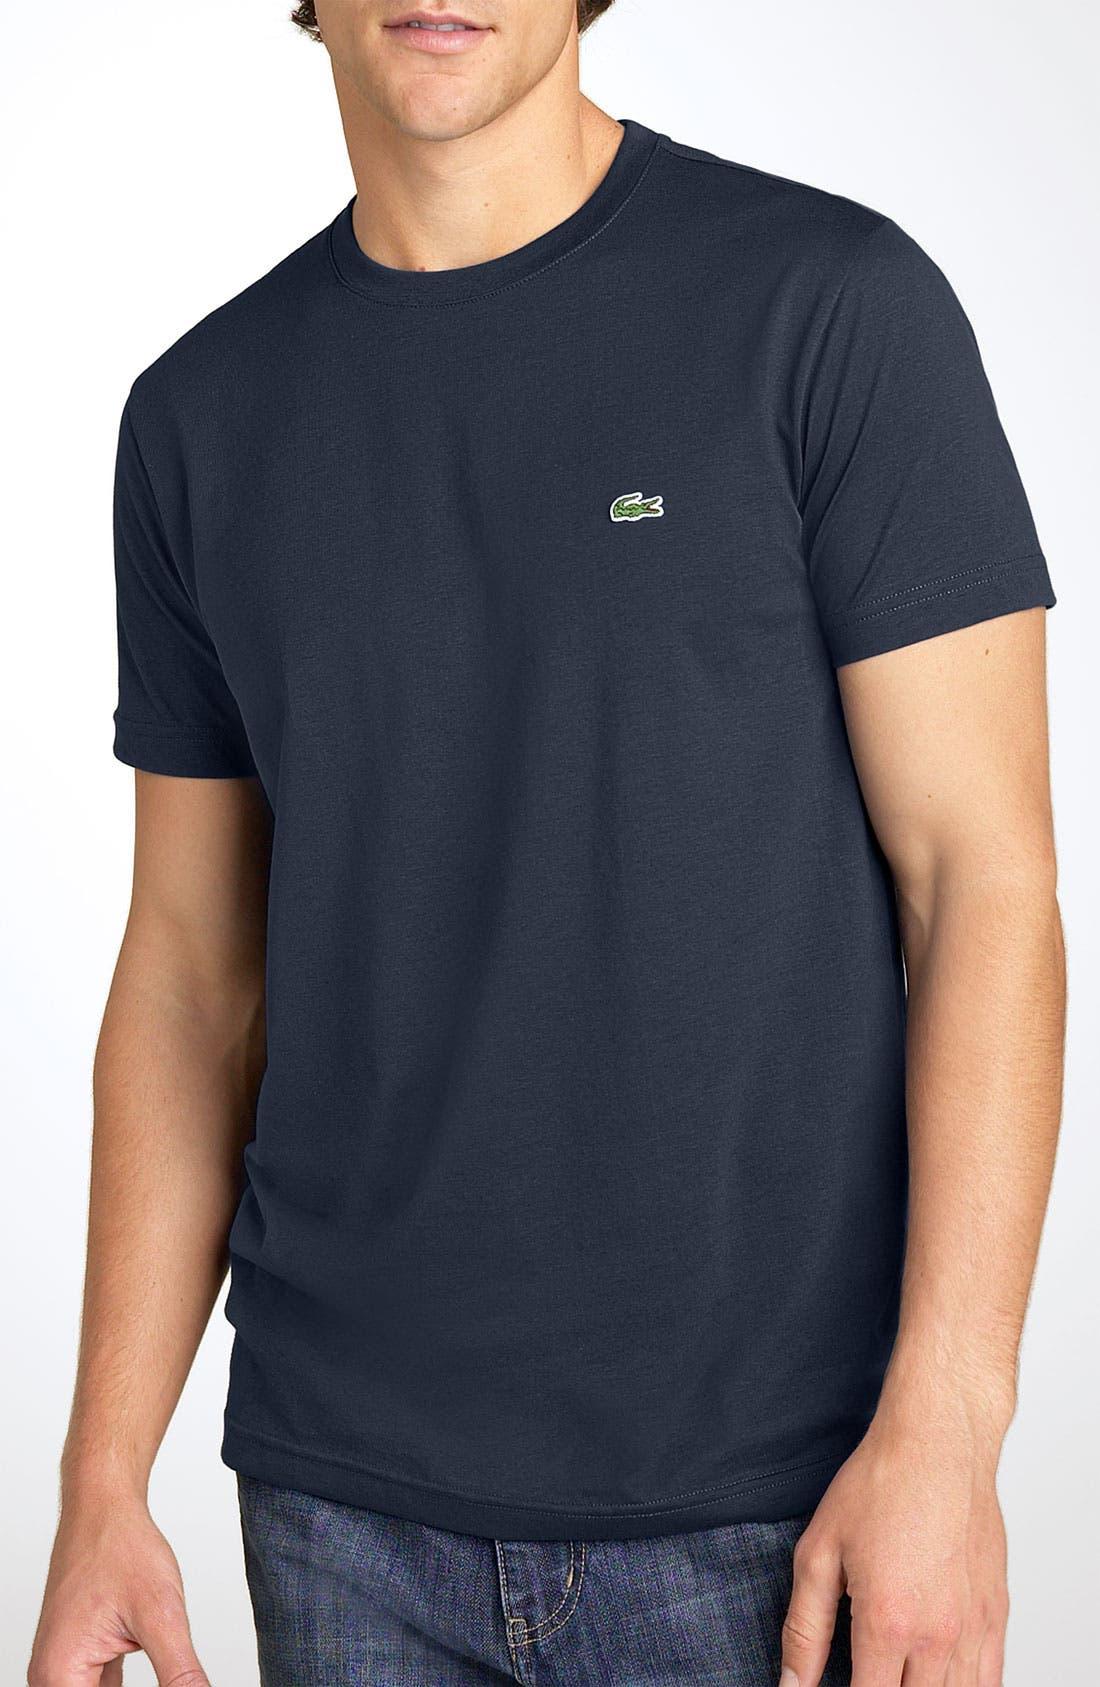 Main Image - Lacoste Pima Cotton T-Shirt (Big)